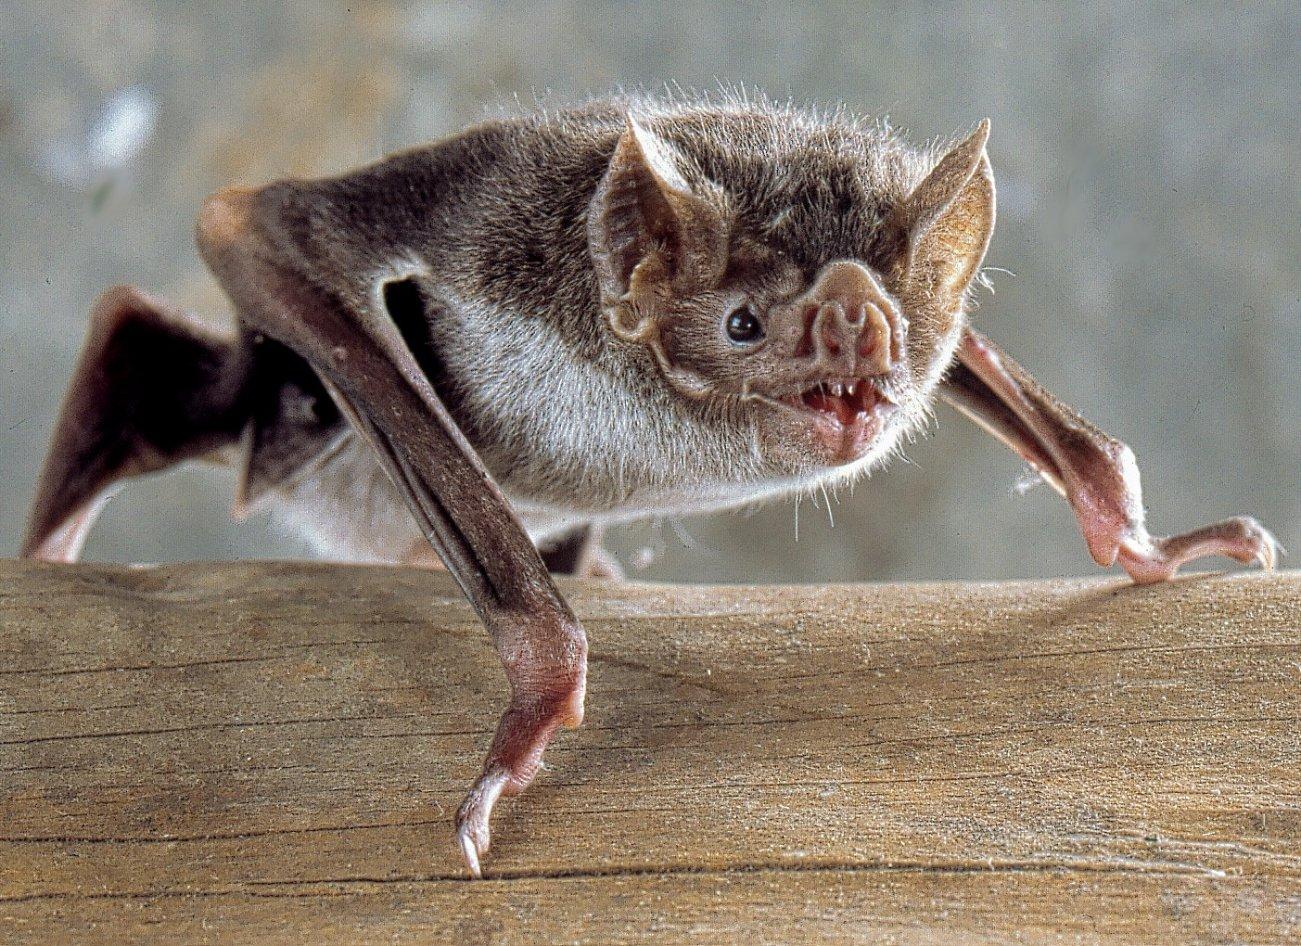 Coronavirus: Why Don't Bats Get Sick?